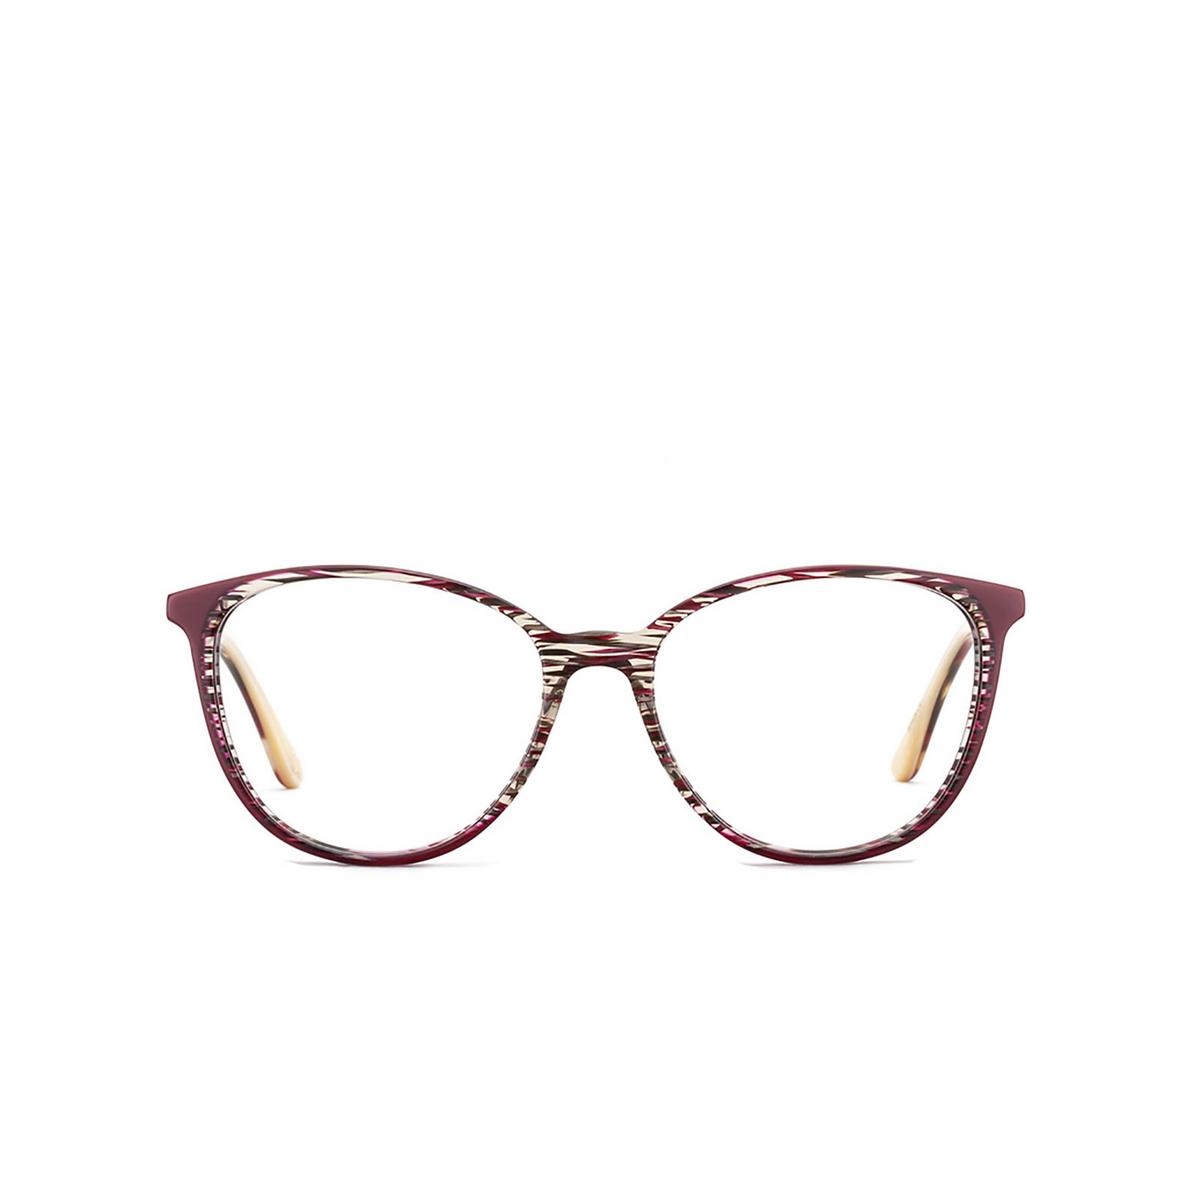 Etnia Barcelona® Butterfly Eyeglasses: Marie color Fubx - front view.